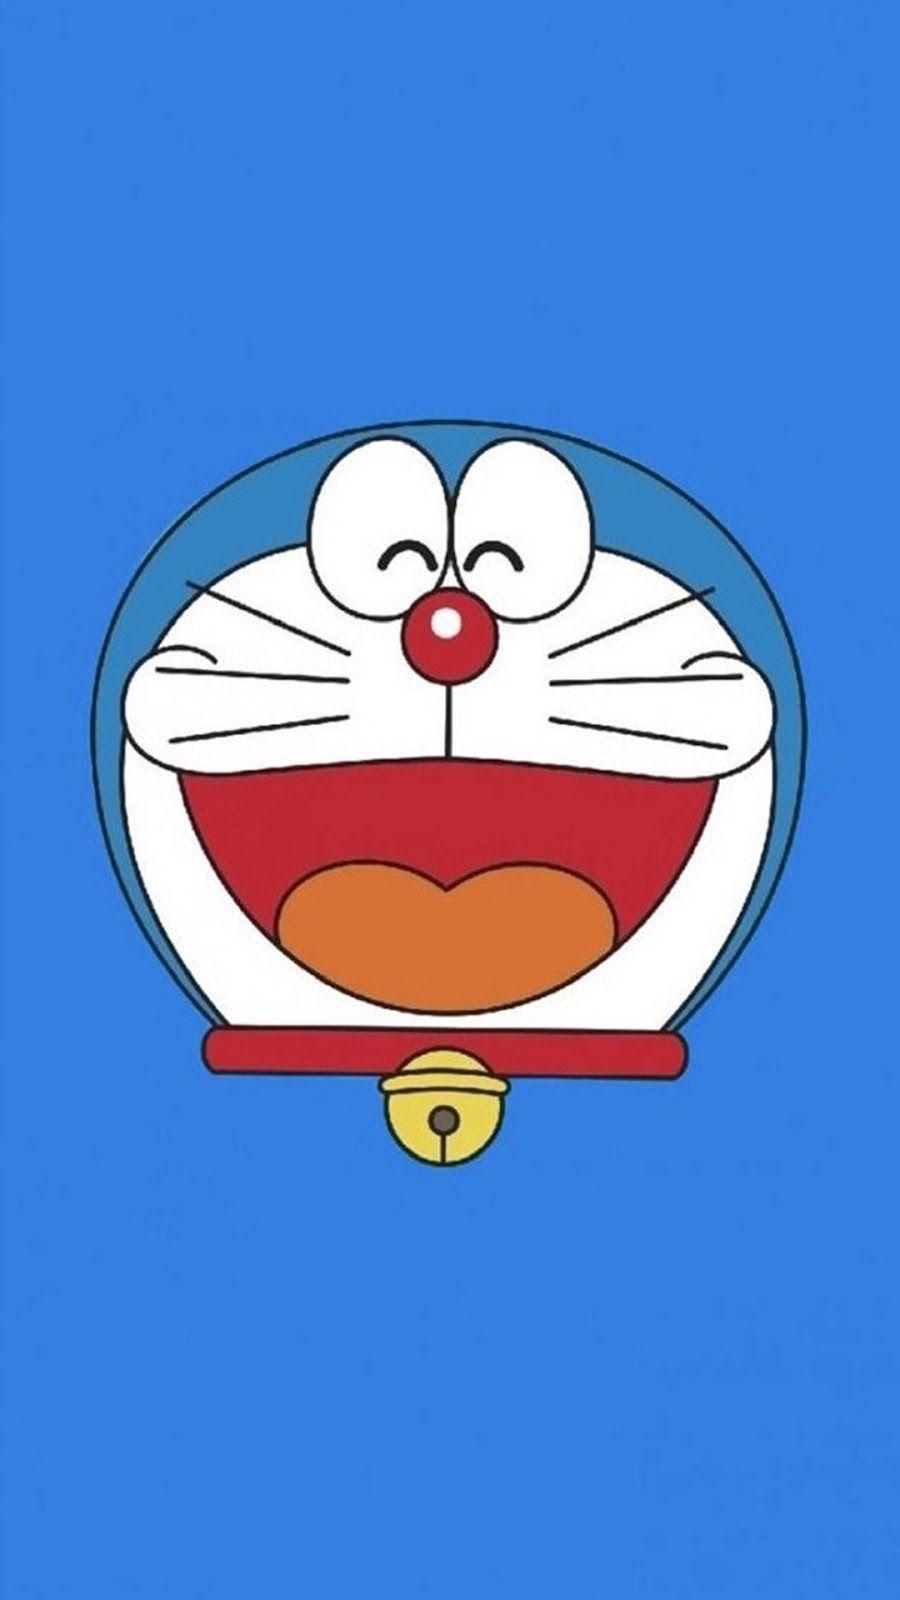 Doraemon wallpaper 3d golf sandpoint elks doraemon and friends wallpapers wallpaper voltagebd Images